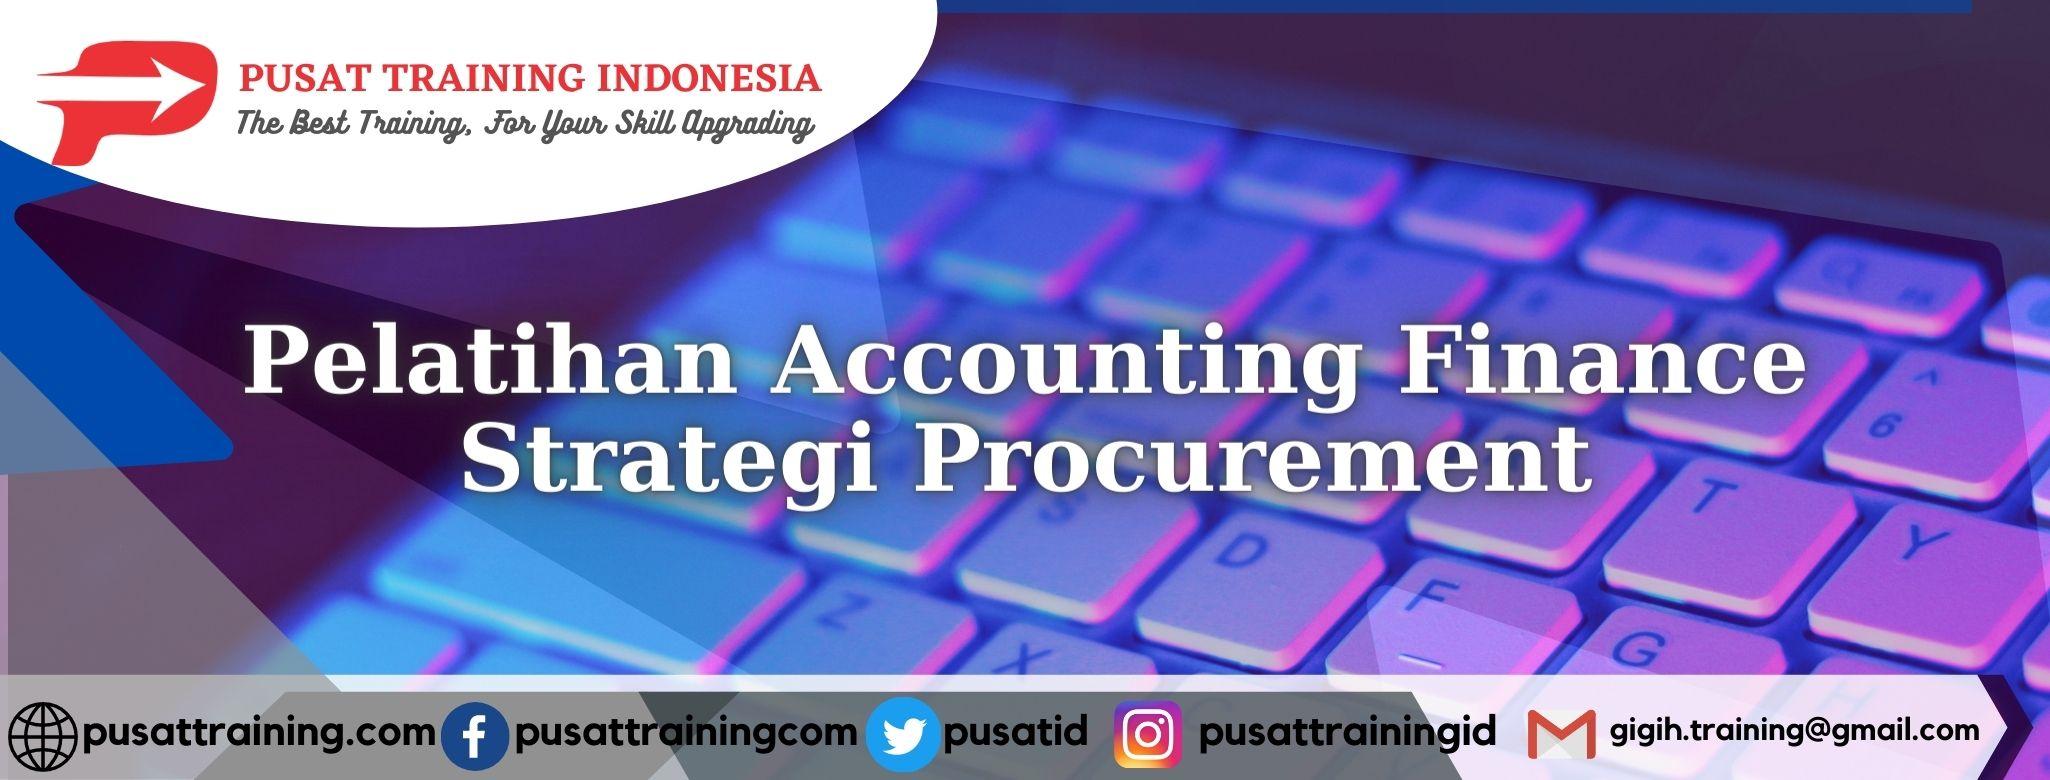 Pelatihan-Accounting-Finance-Strategi-Procurement